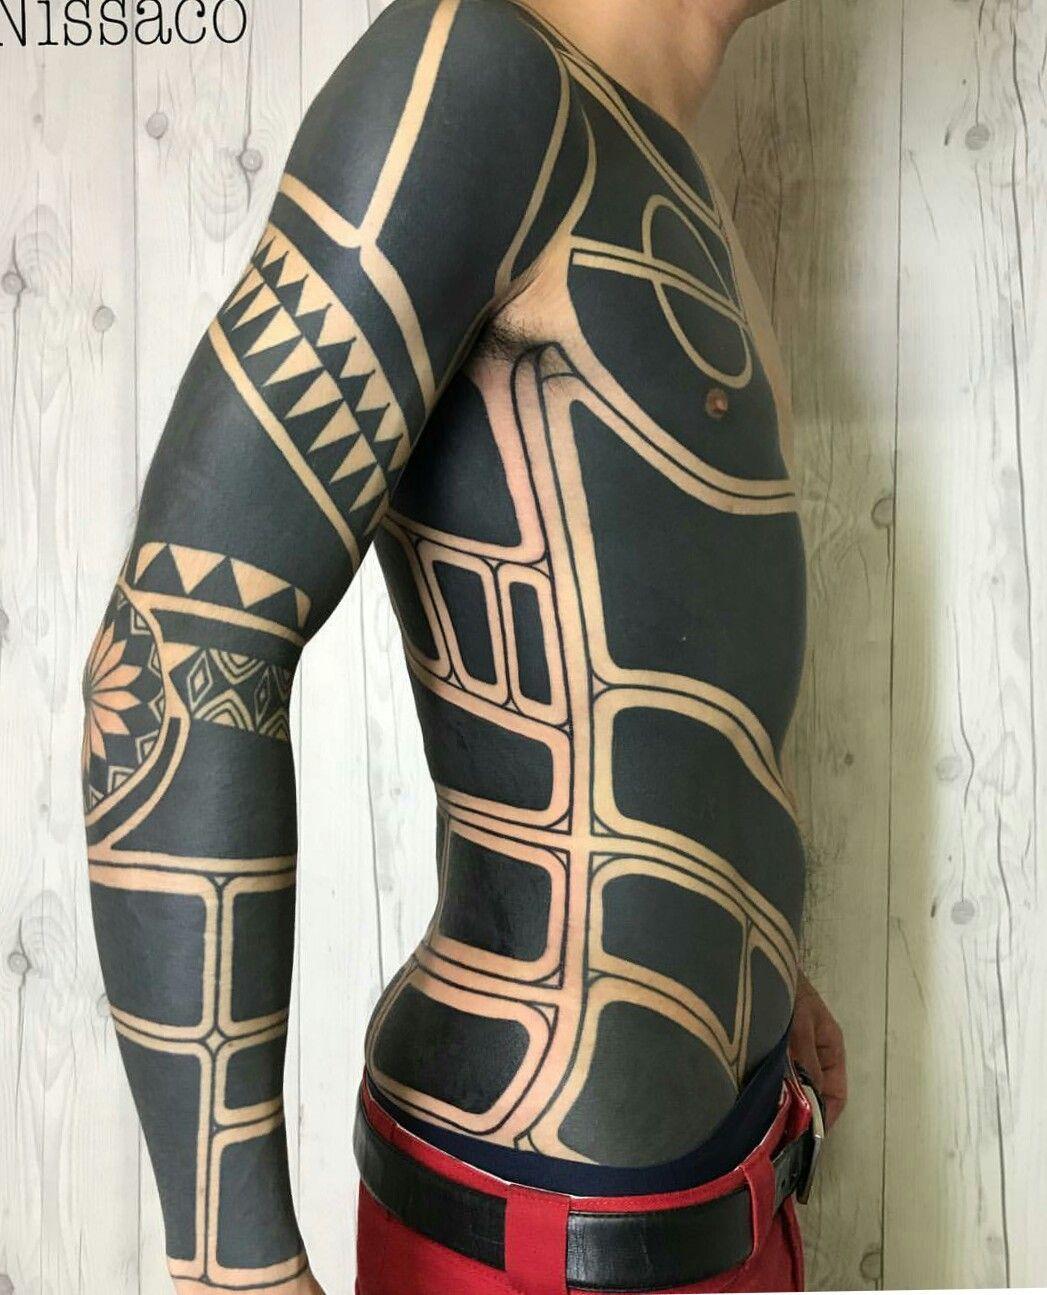 Nissaco Marquesantattoos Marquesan Tattoos Tattoo Electronic Circuit Board Full Sleeve Blackwork Male Bike Tribal Black Large